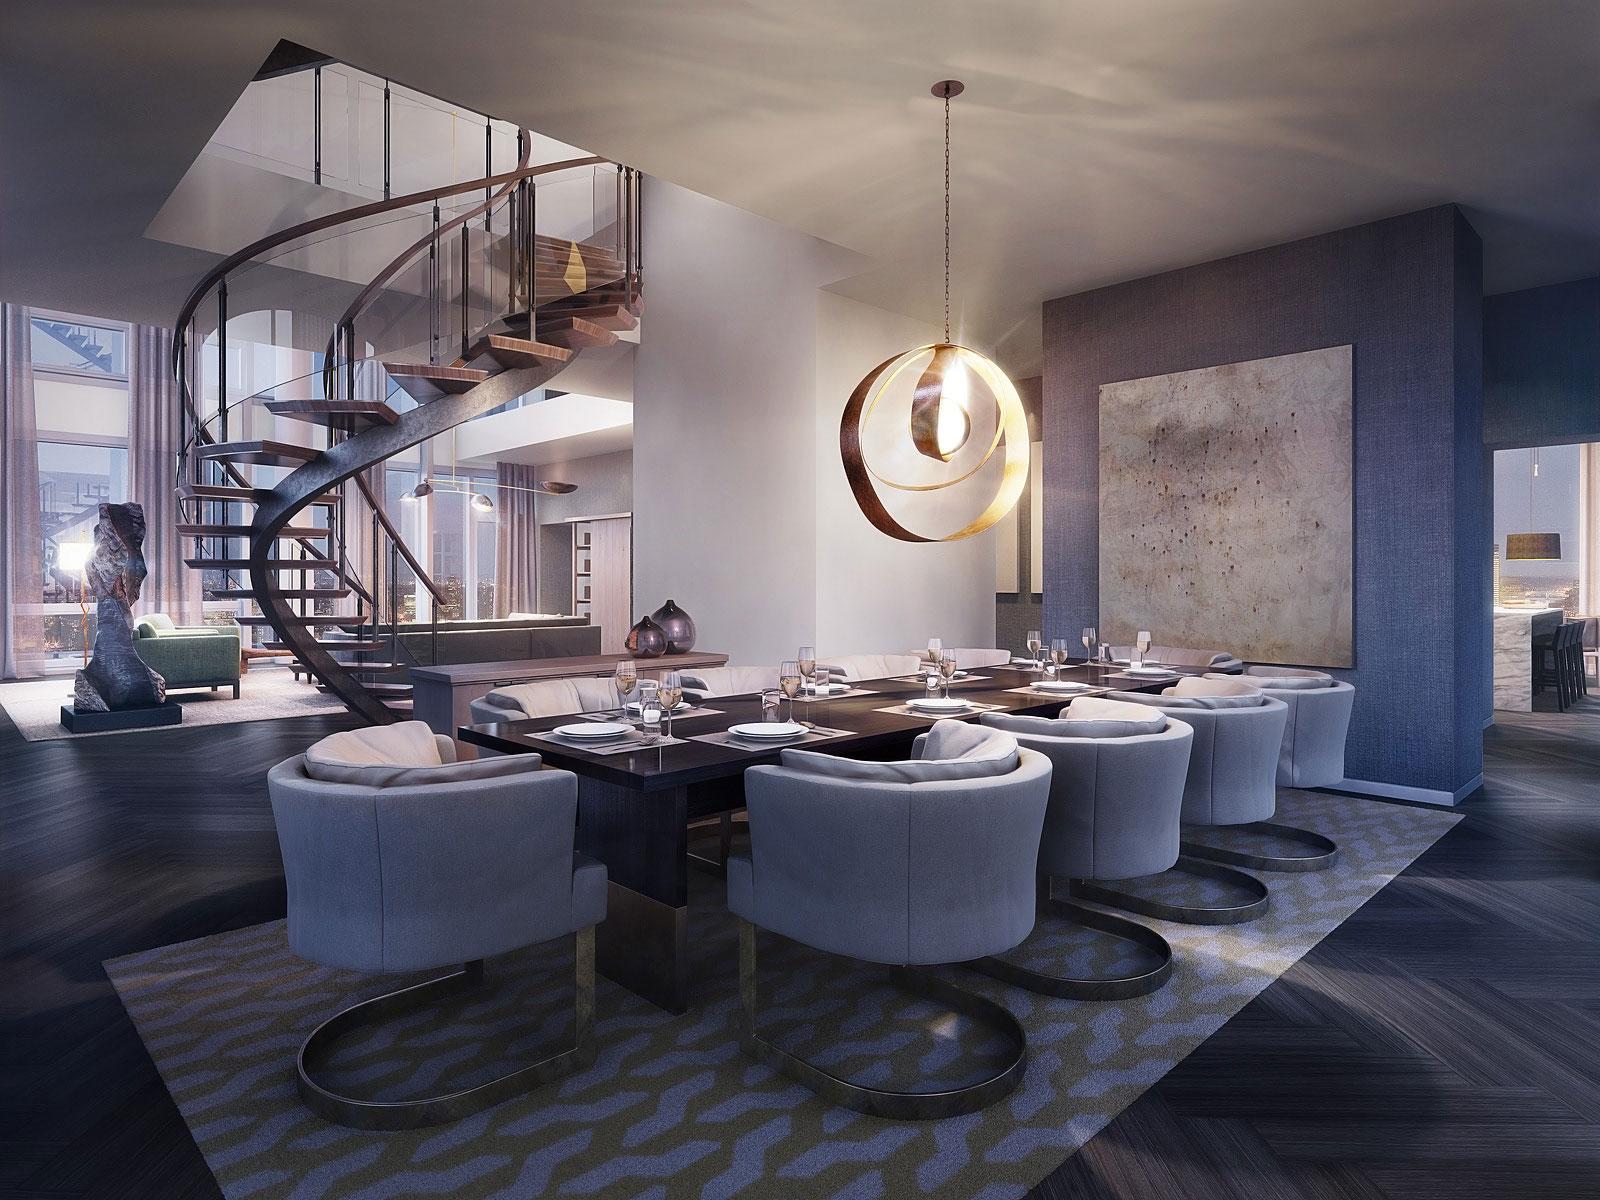 One Madison New York rupert murdoch's $57.25 million one madison triplex penthouse